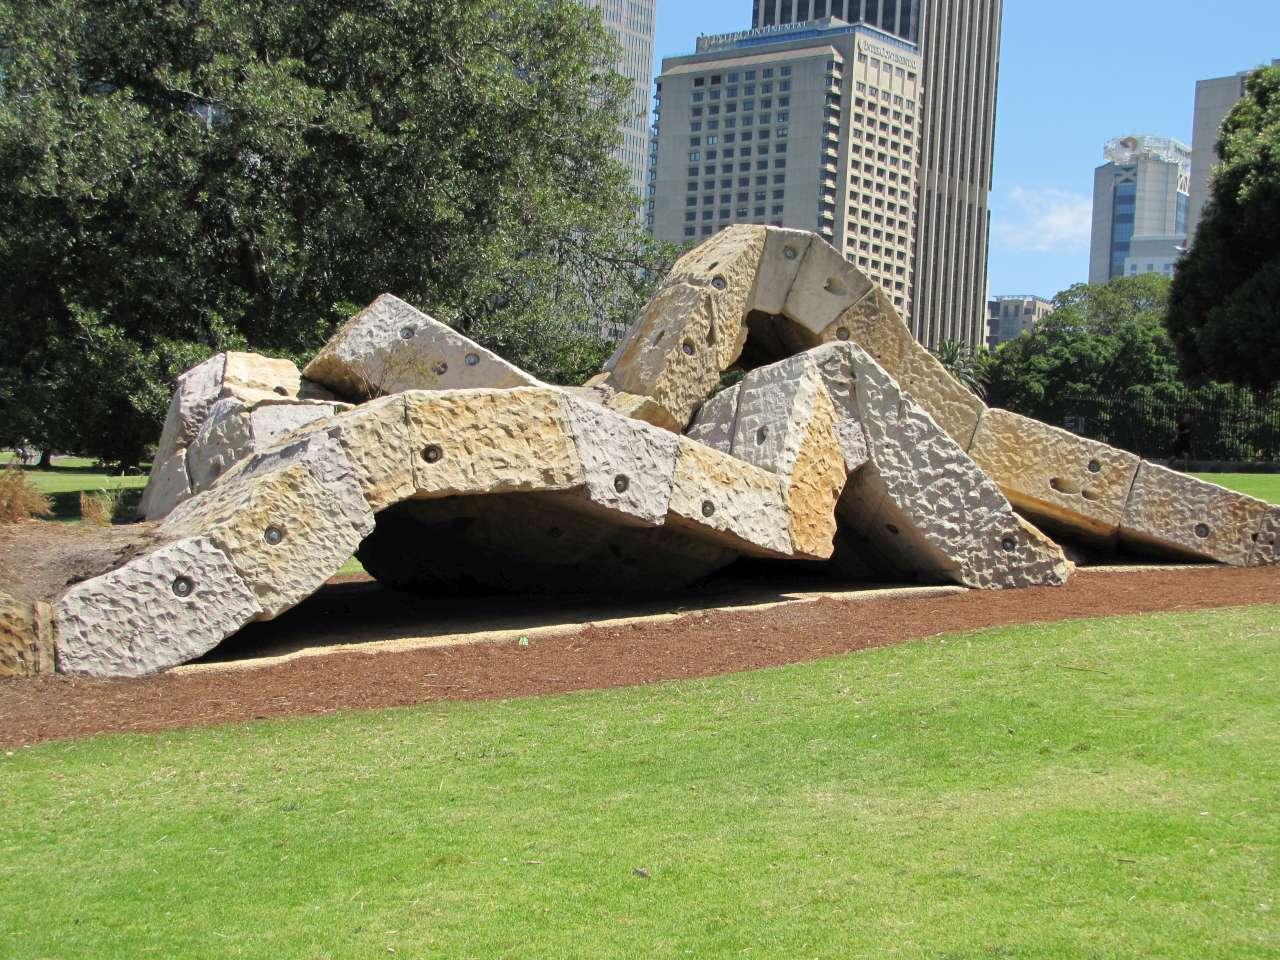 Wurrungwuri royal botanic garden sydney australia for Landscape gardeners sydney